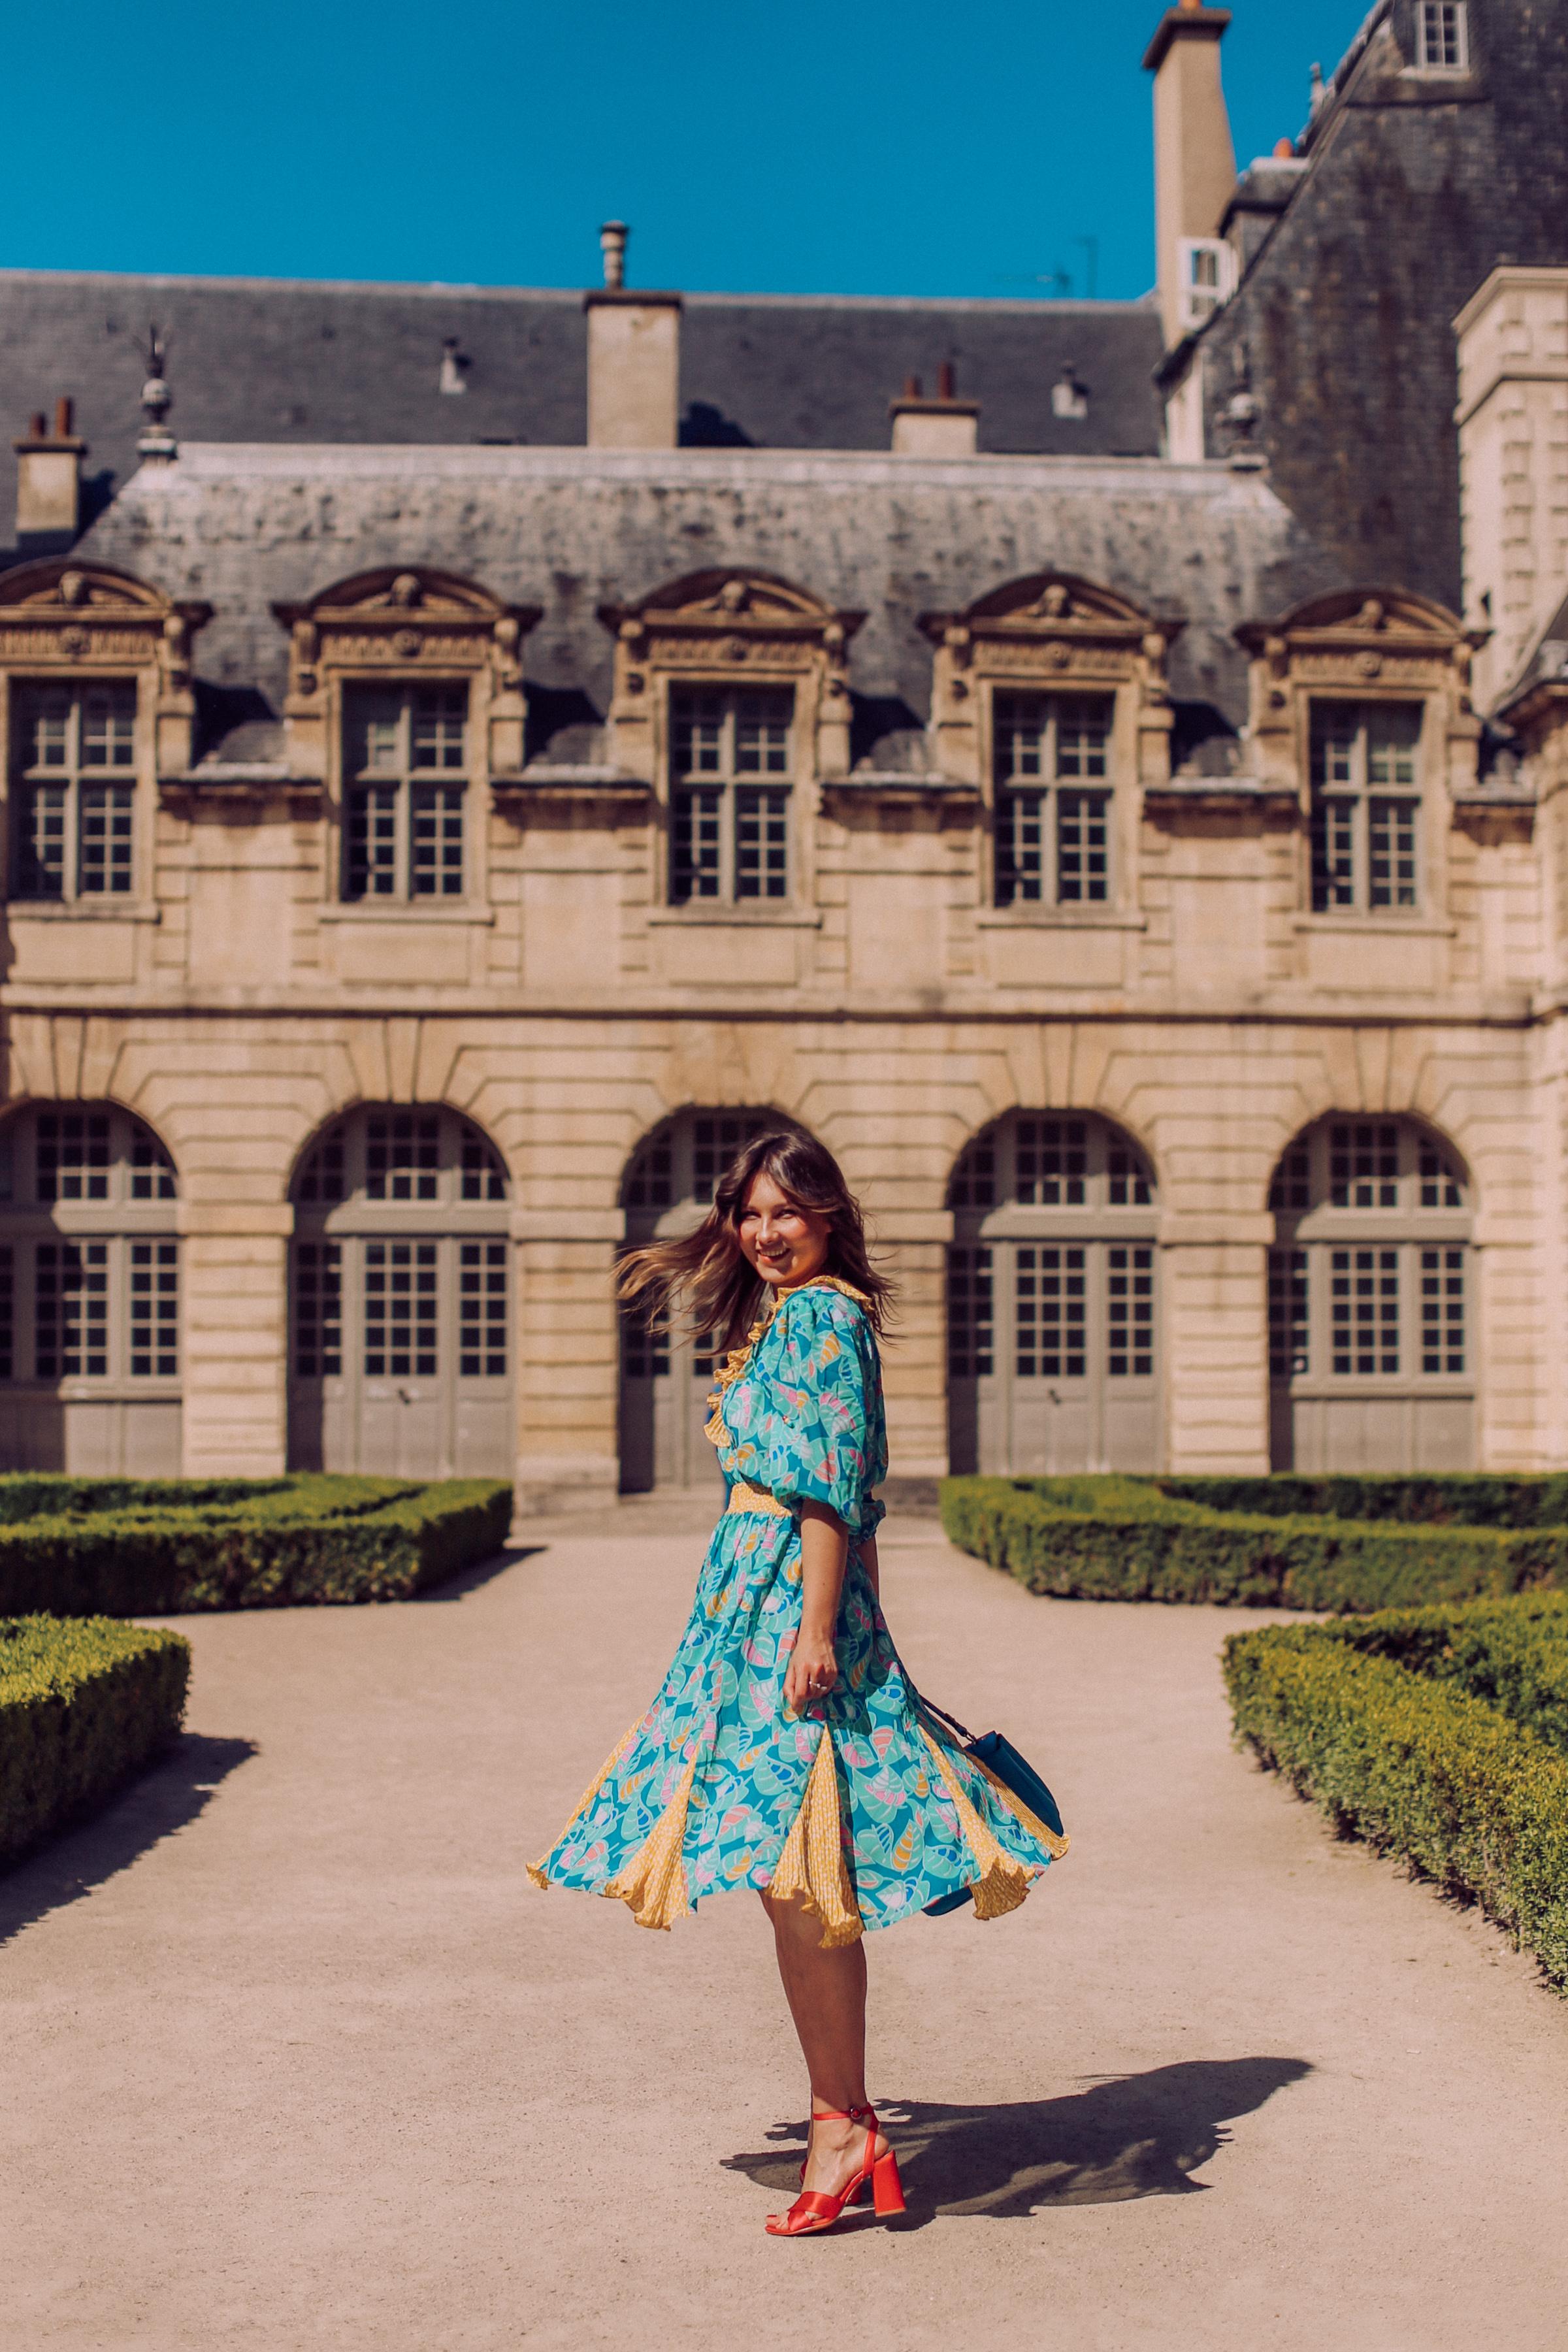 paris-vintage-dress-angelica-6955